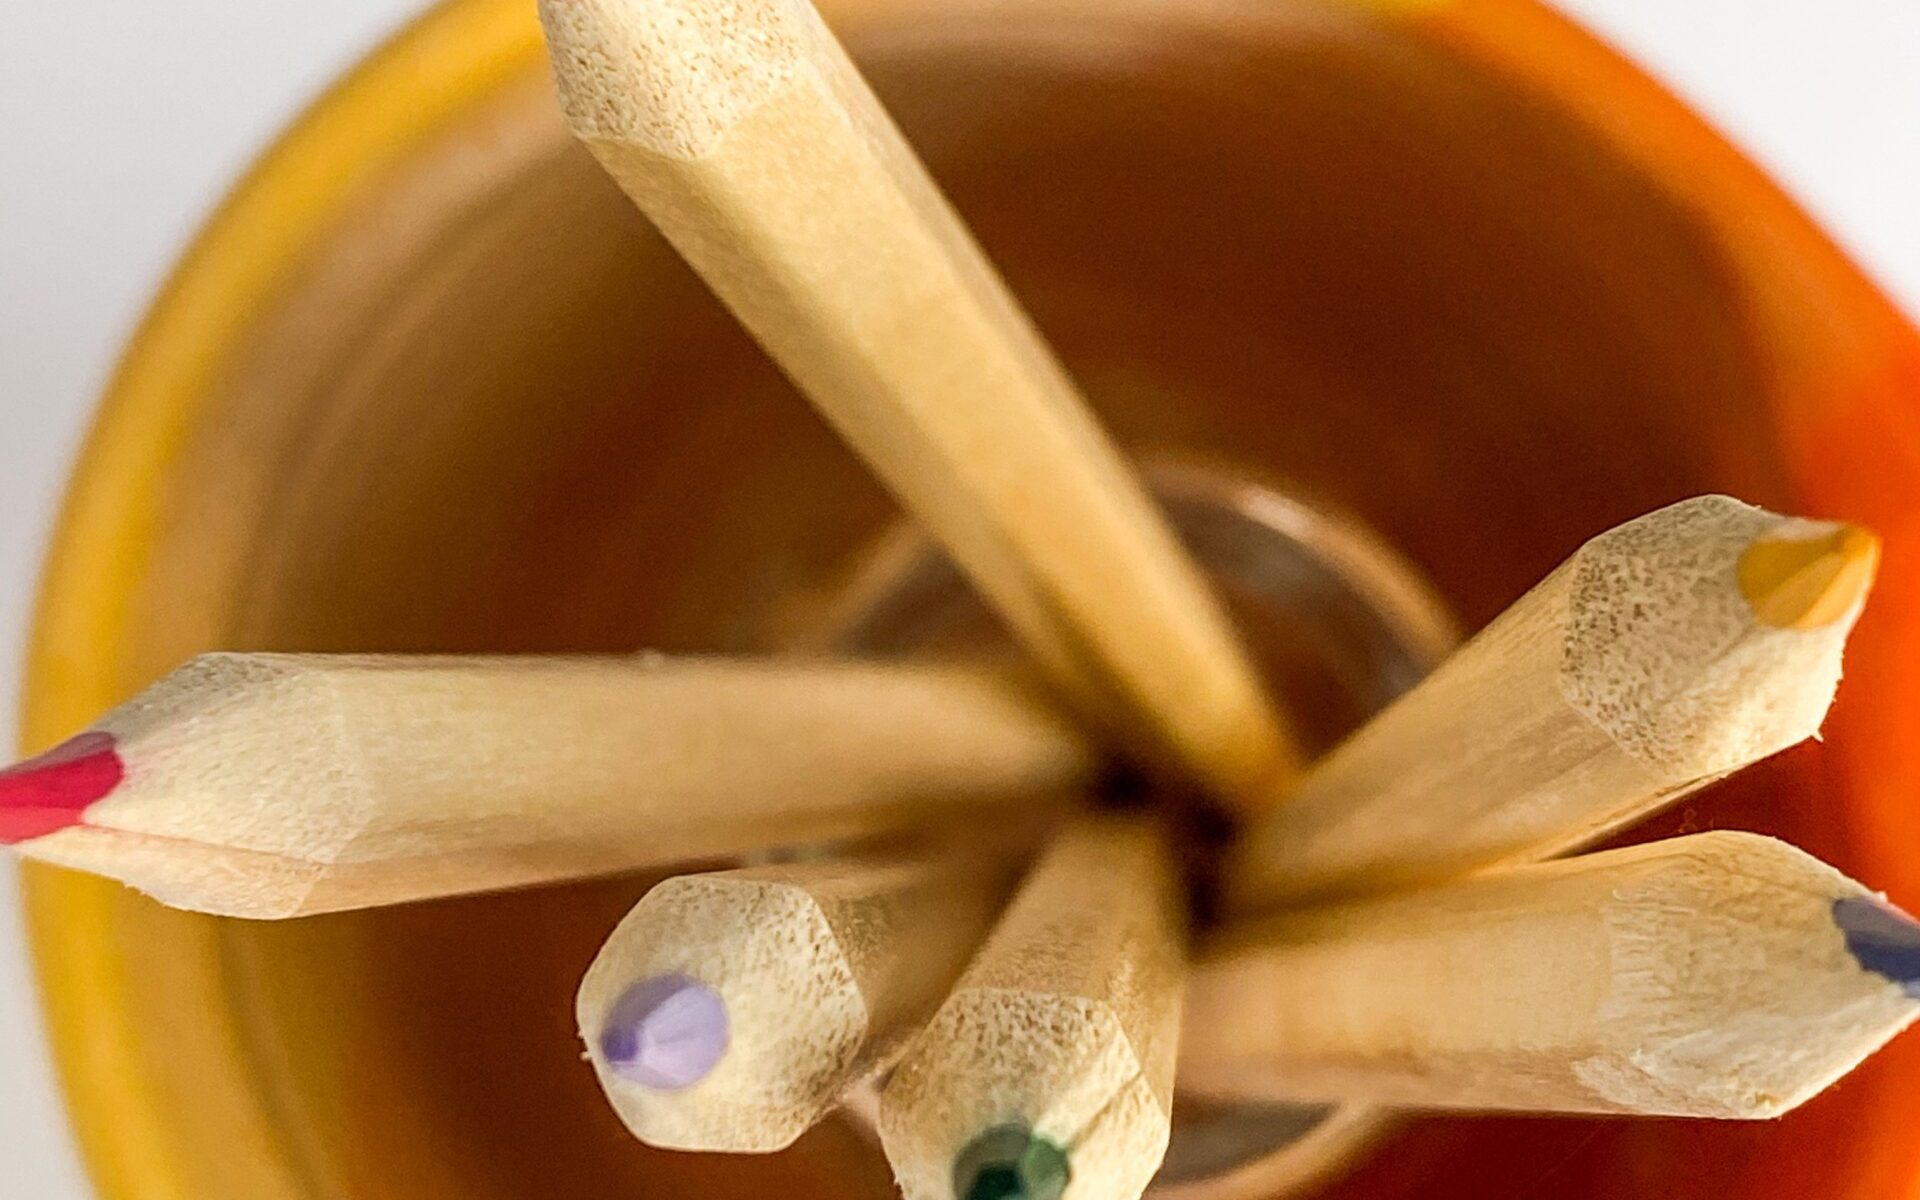 Pencils in Orange Mug - Editing Tools